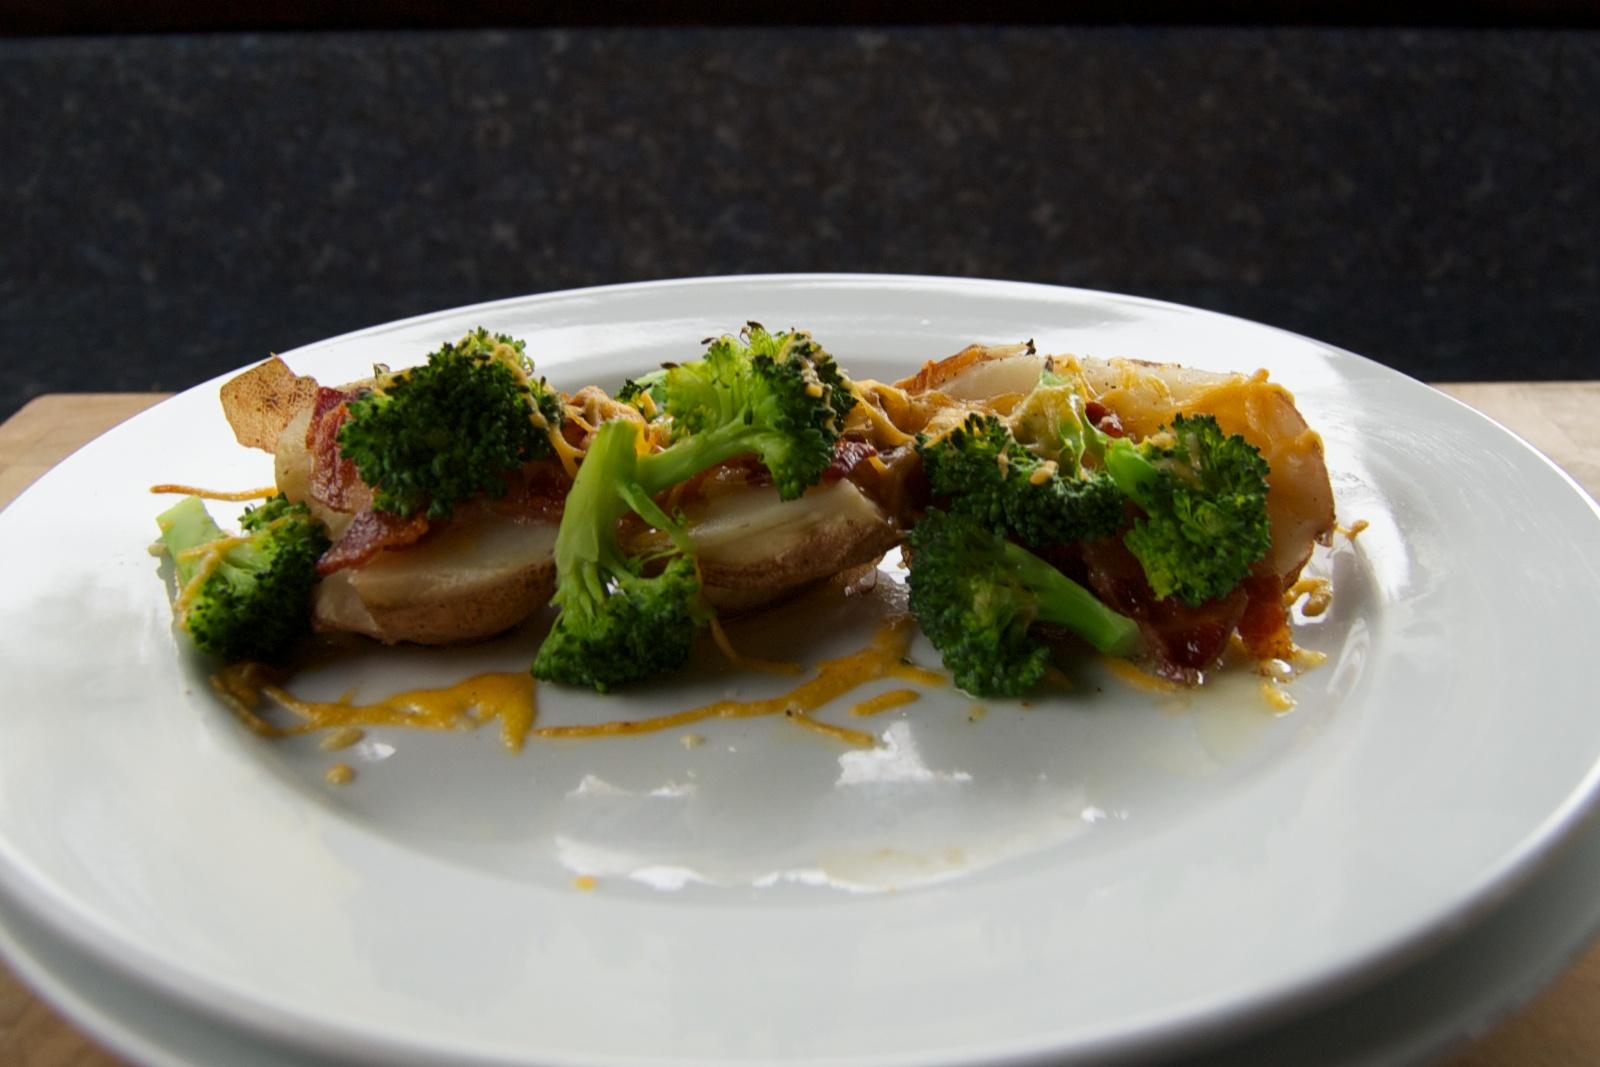 http://blog.rickk.com/food/2012/10/10/ate.2012.10.10.l.jpg